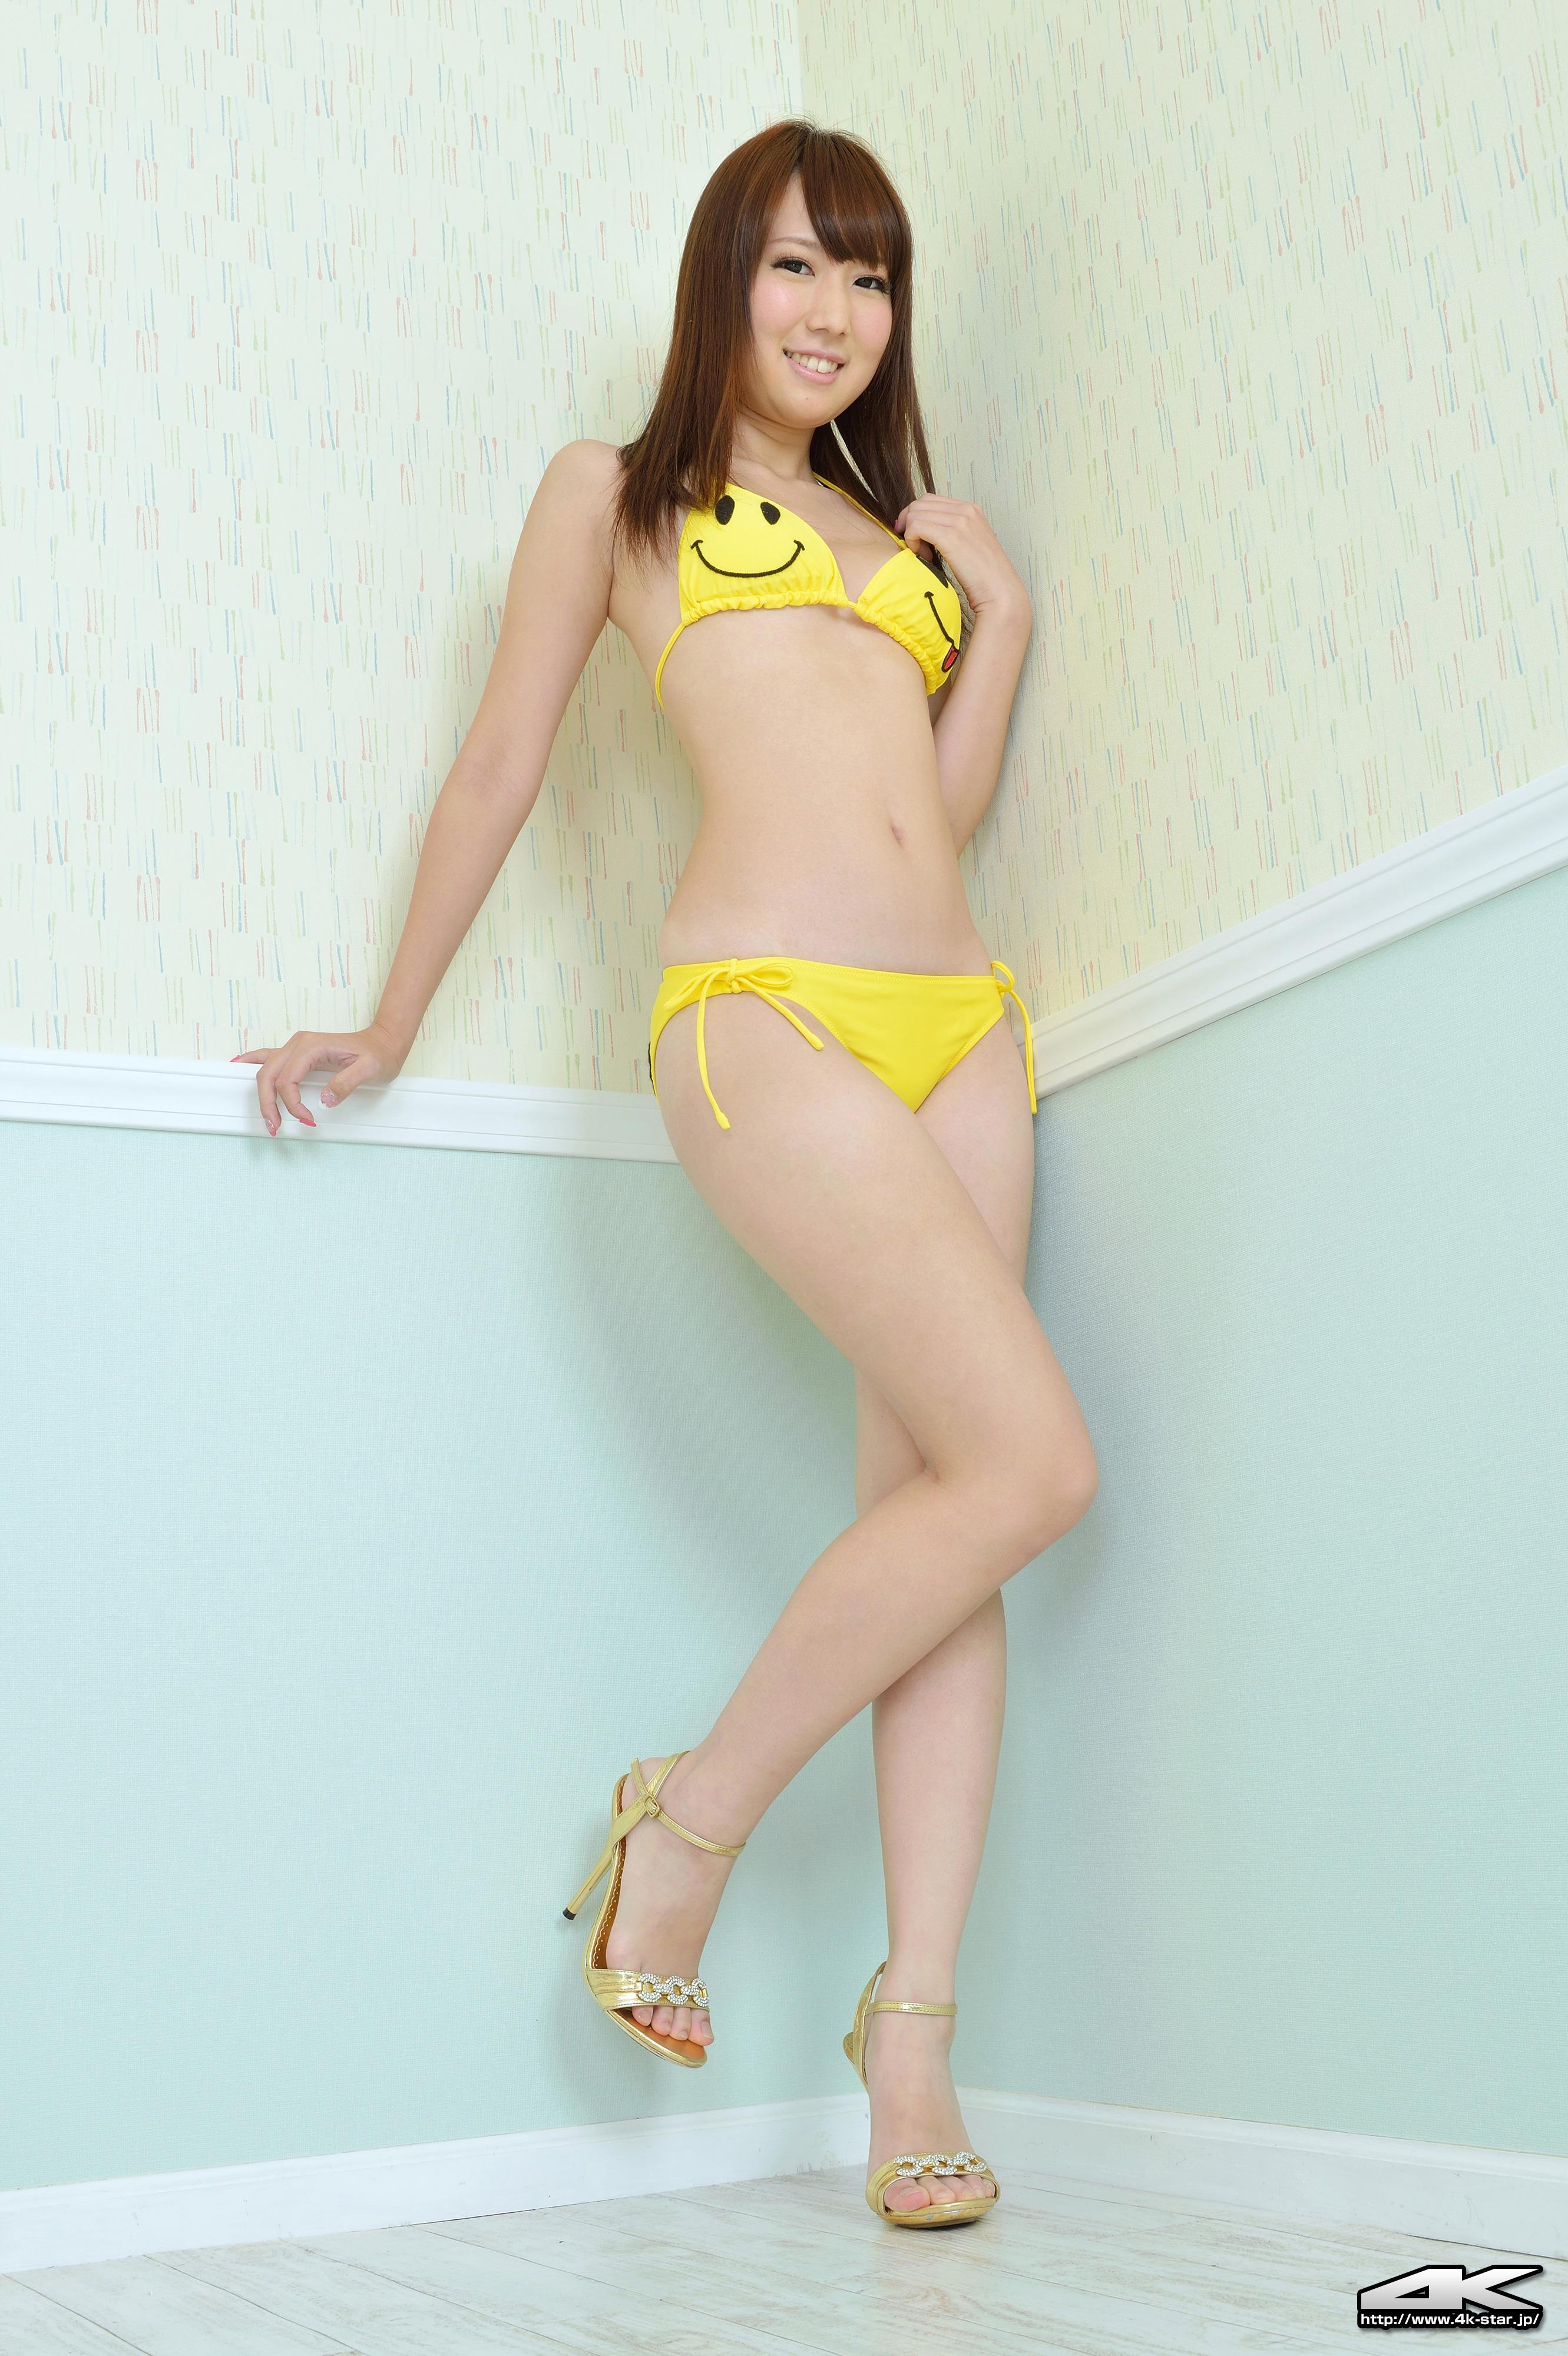 [4K-STAR套图]No.00126 高橋七海(高桥七海,Nanami Takahoshi)黄色性感比基尼泳装私房写真集